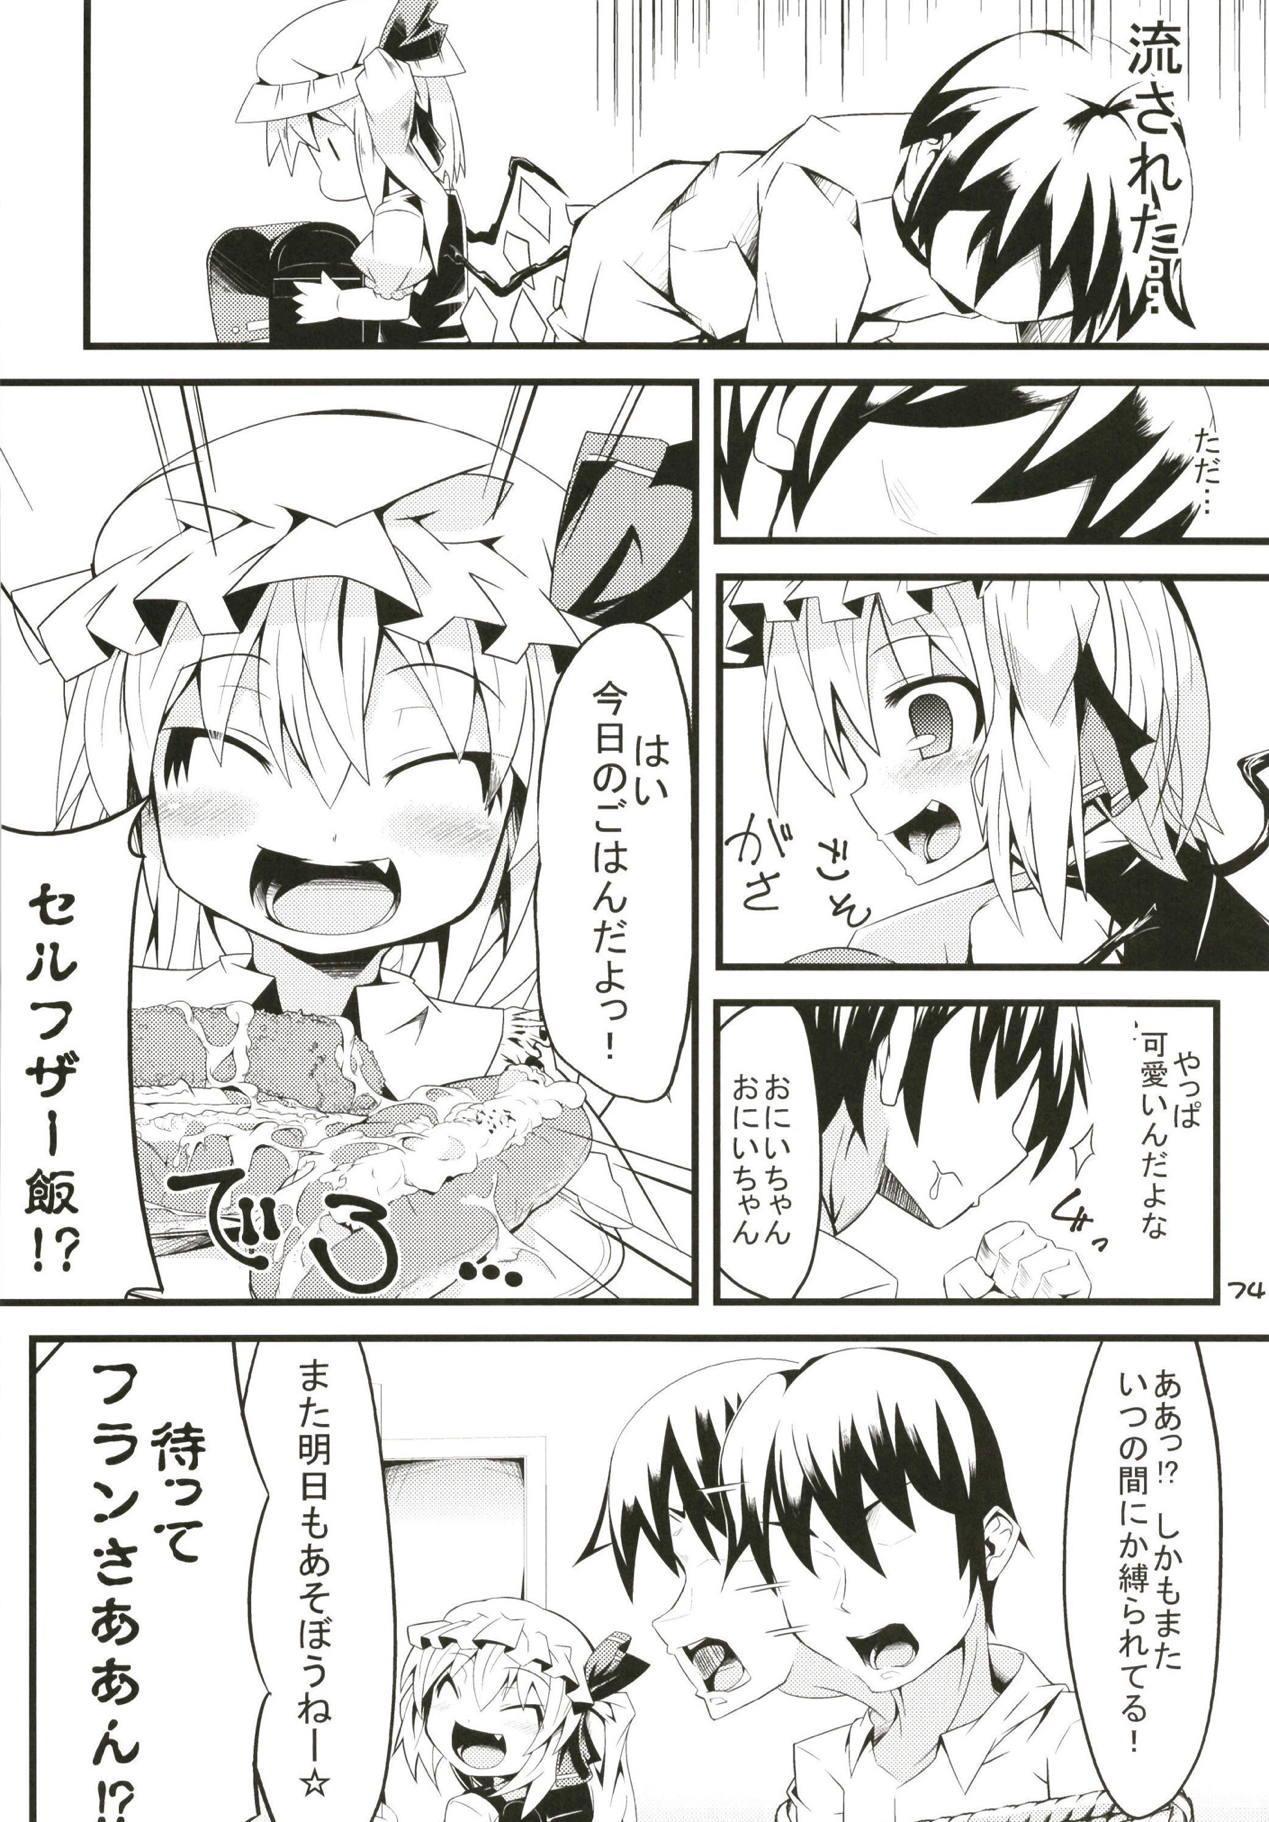 Zeenbu Loli Bitch Flan-chan Soushuuhen 01 72